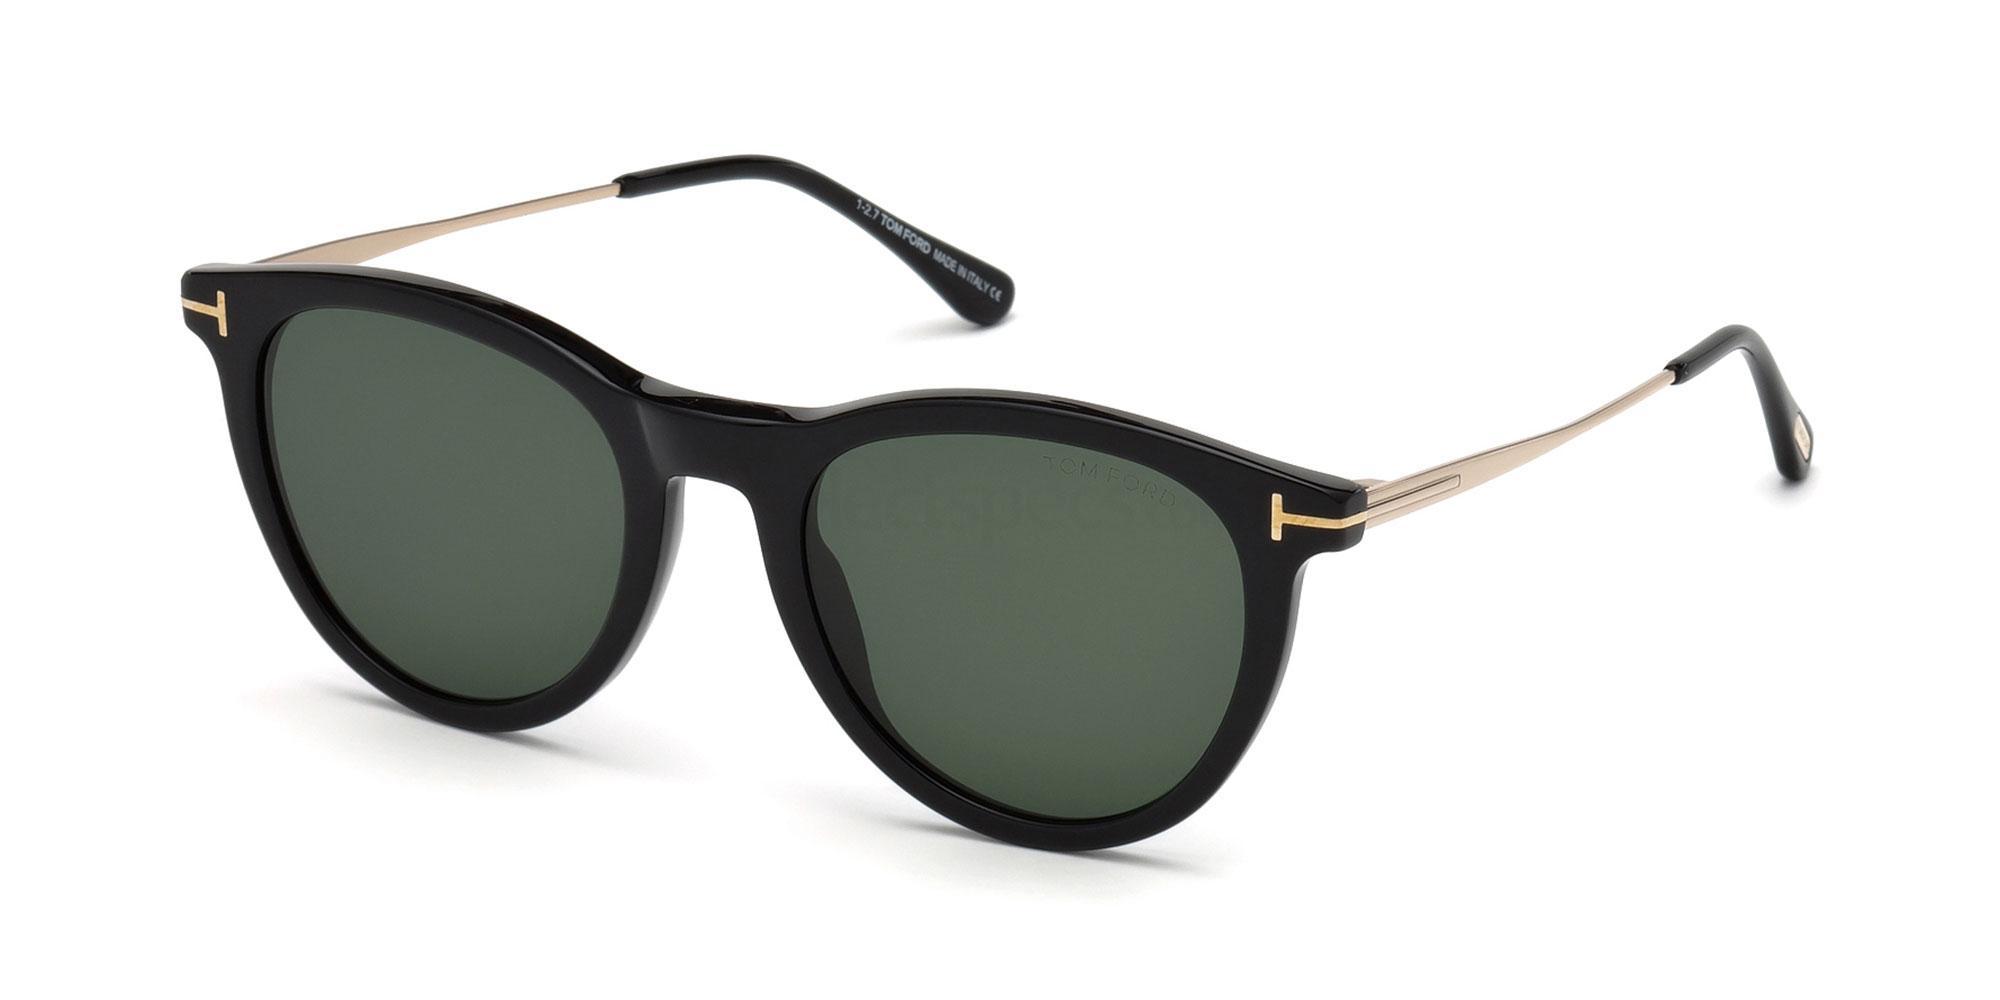 01N FT0626 Sunglasses, Tom Ford